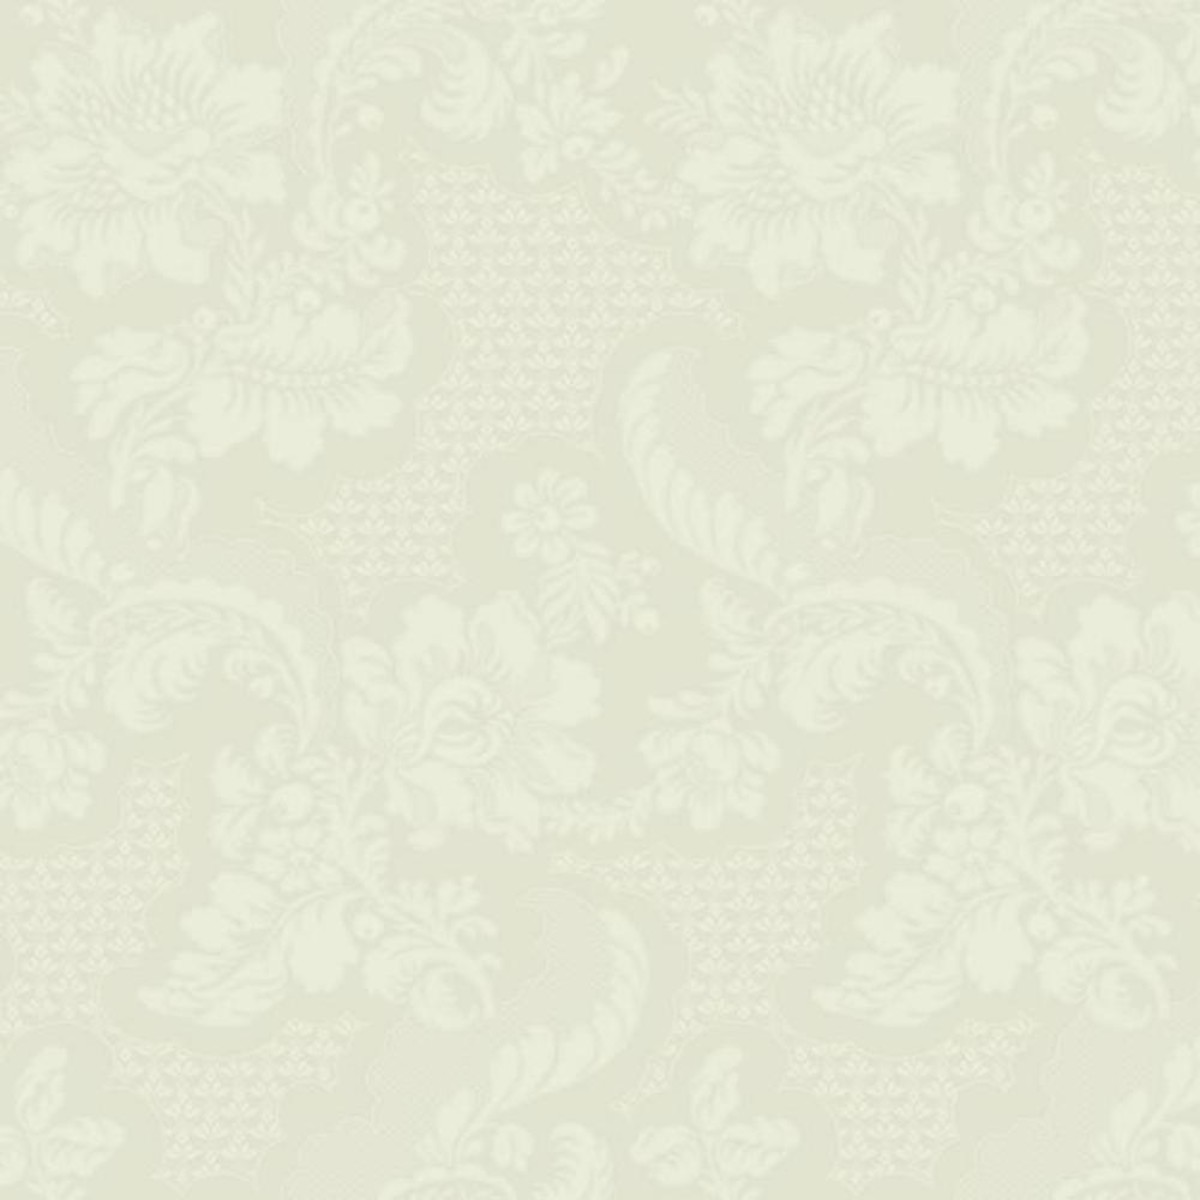 Обои бумажные York Wallcoverings Williamsburg III серые GS6257 0.68 м